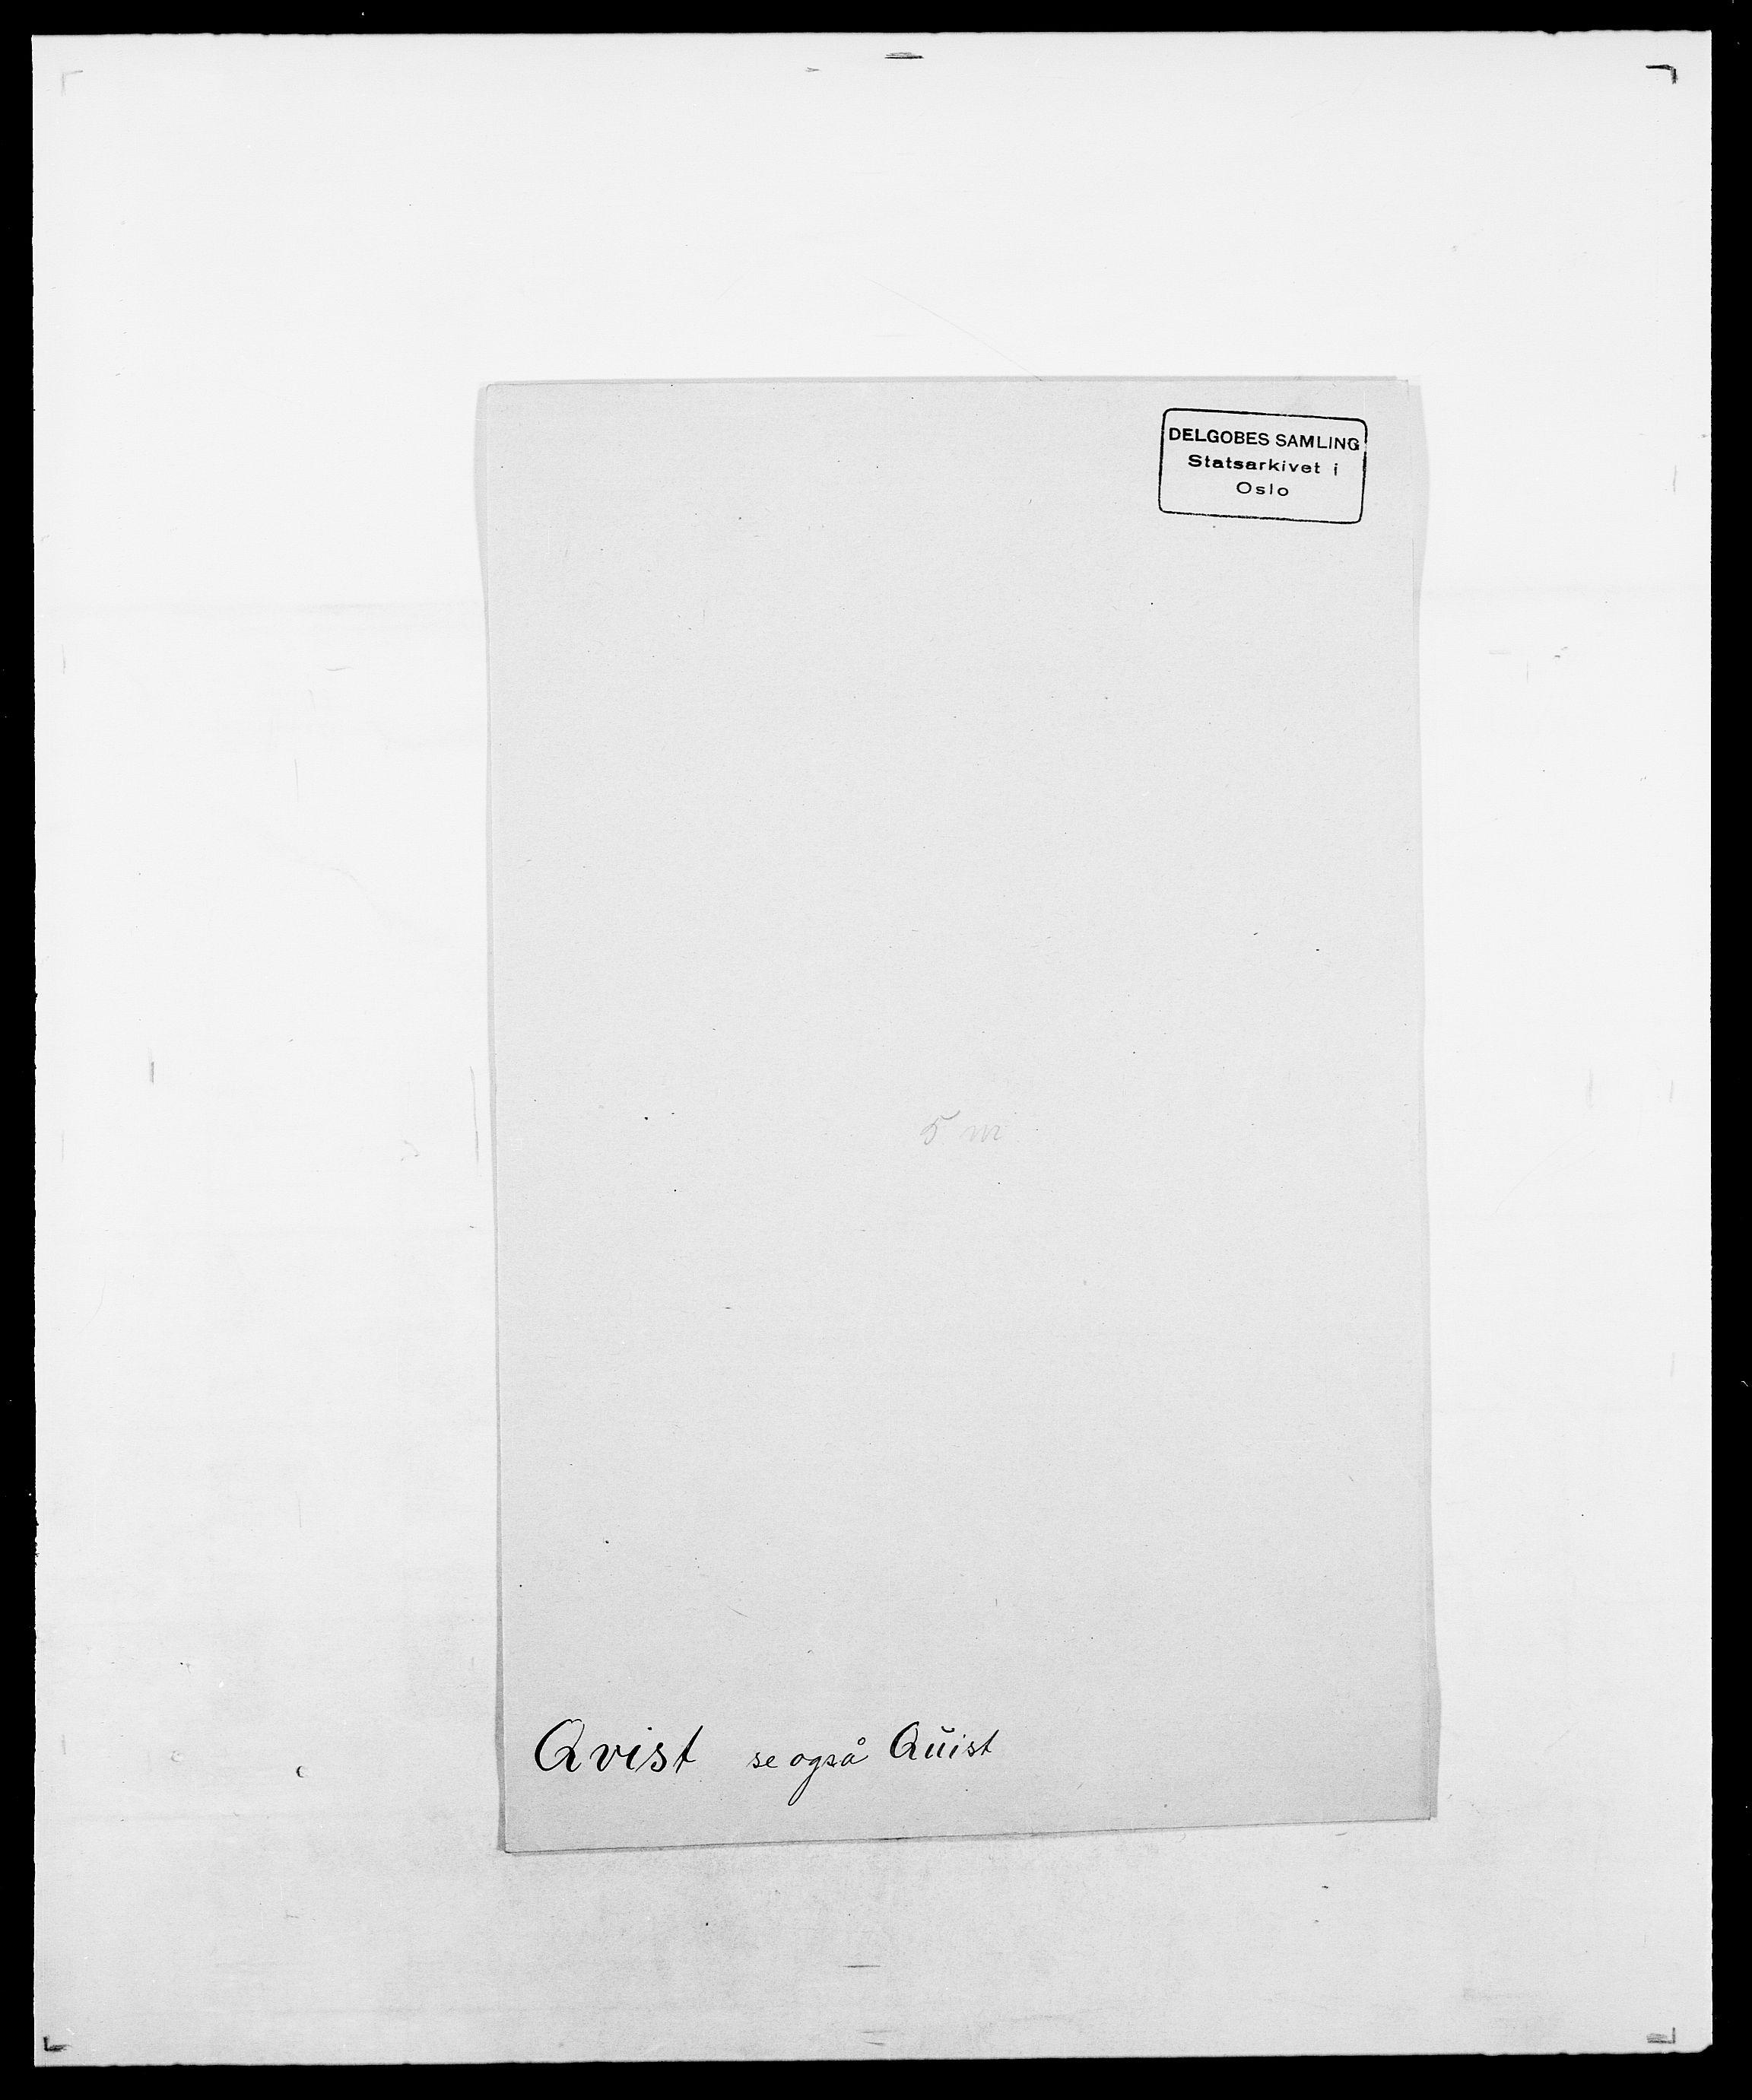 SAO, Delgobe, Charles Antoine - samling, D/Da/L0031: de Place - Raaum, s. 509